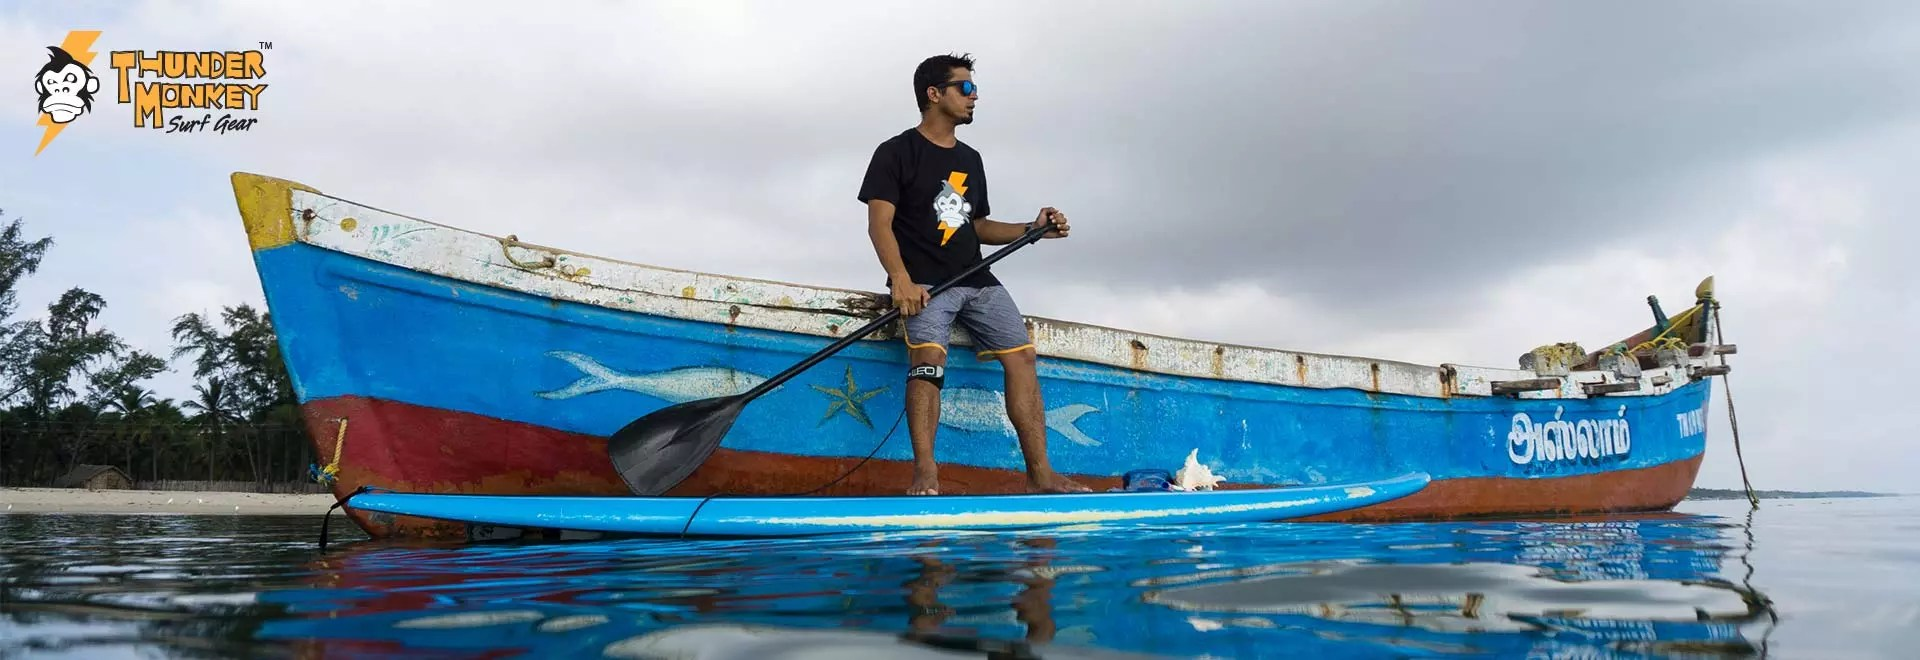 Thunder Monkey Surf Gear - India's Own Surf Brand